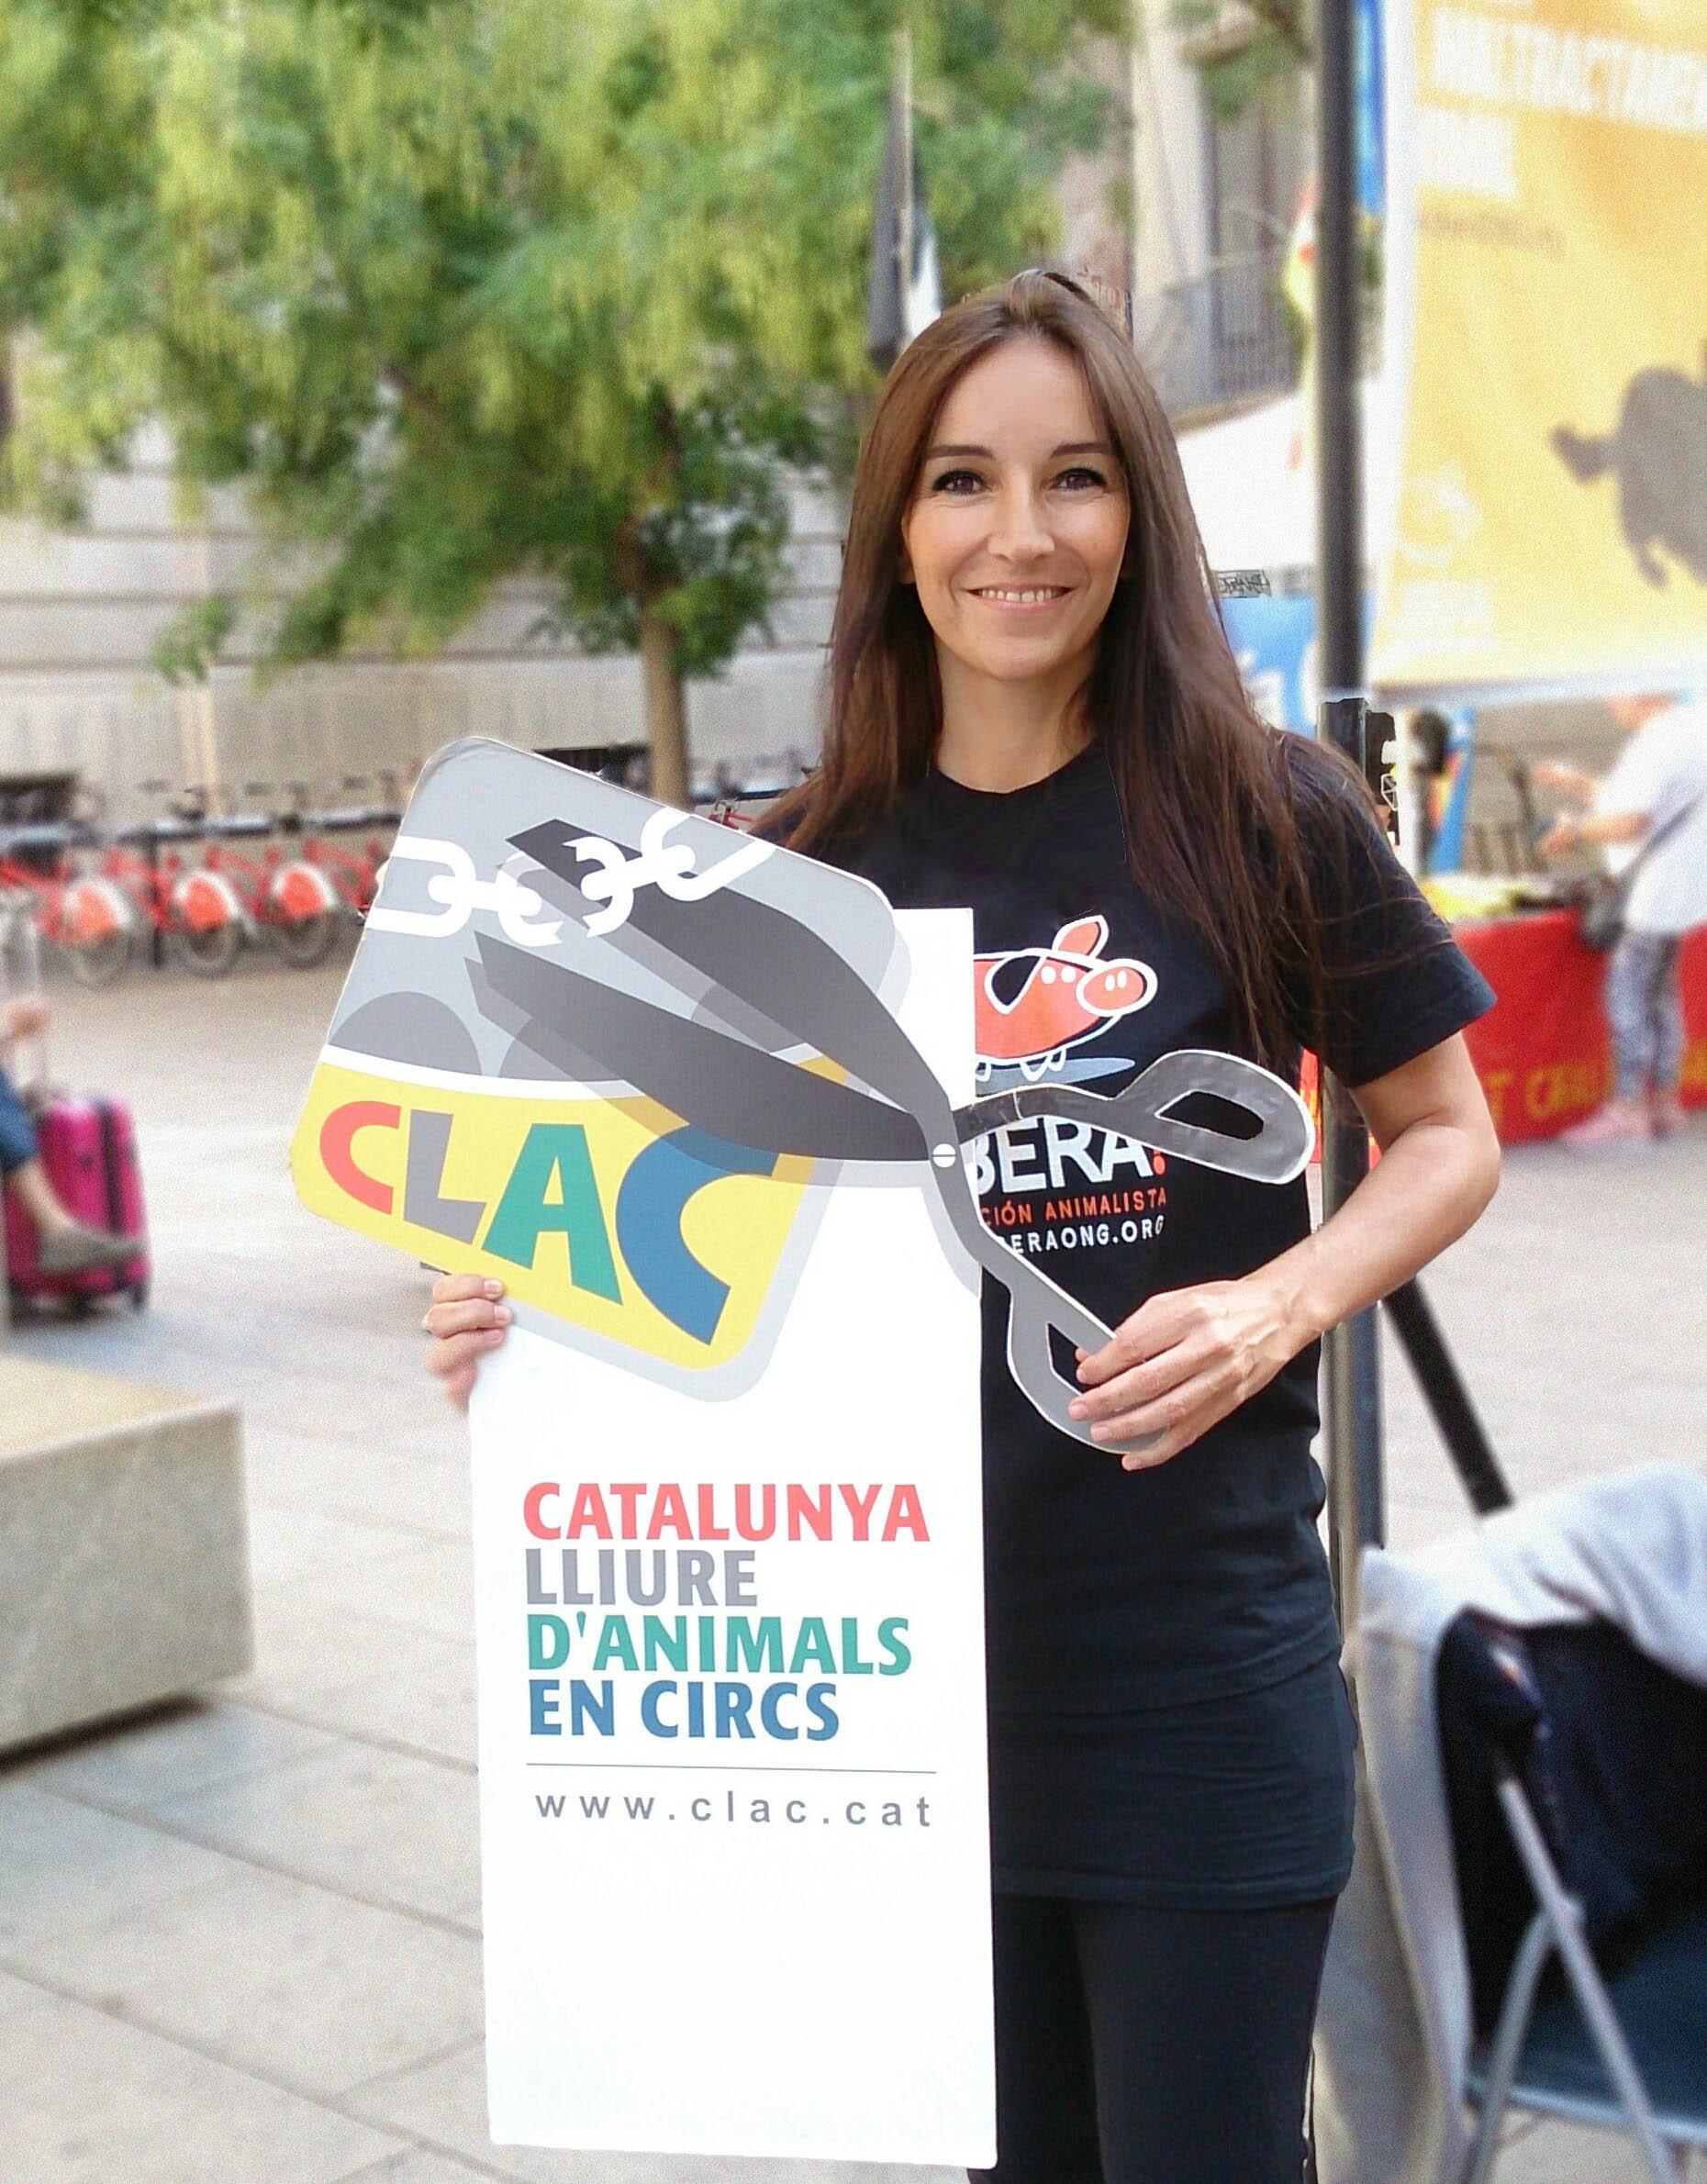 Cristina Olmos